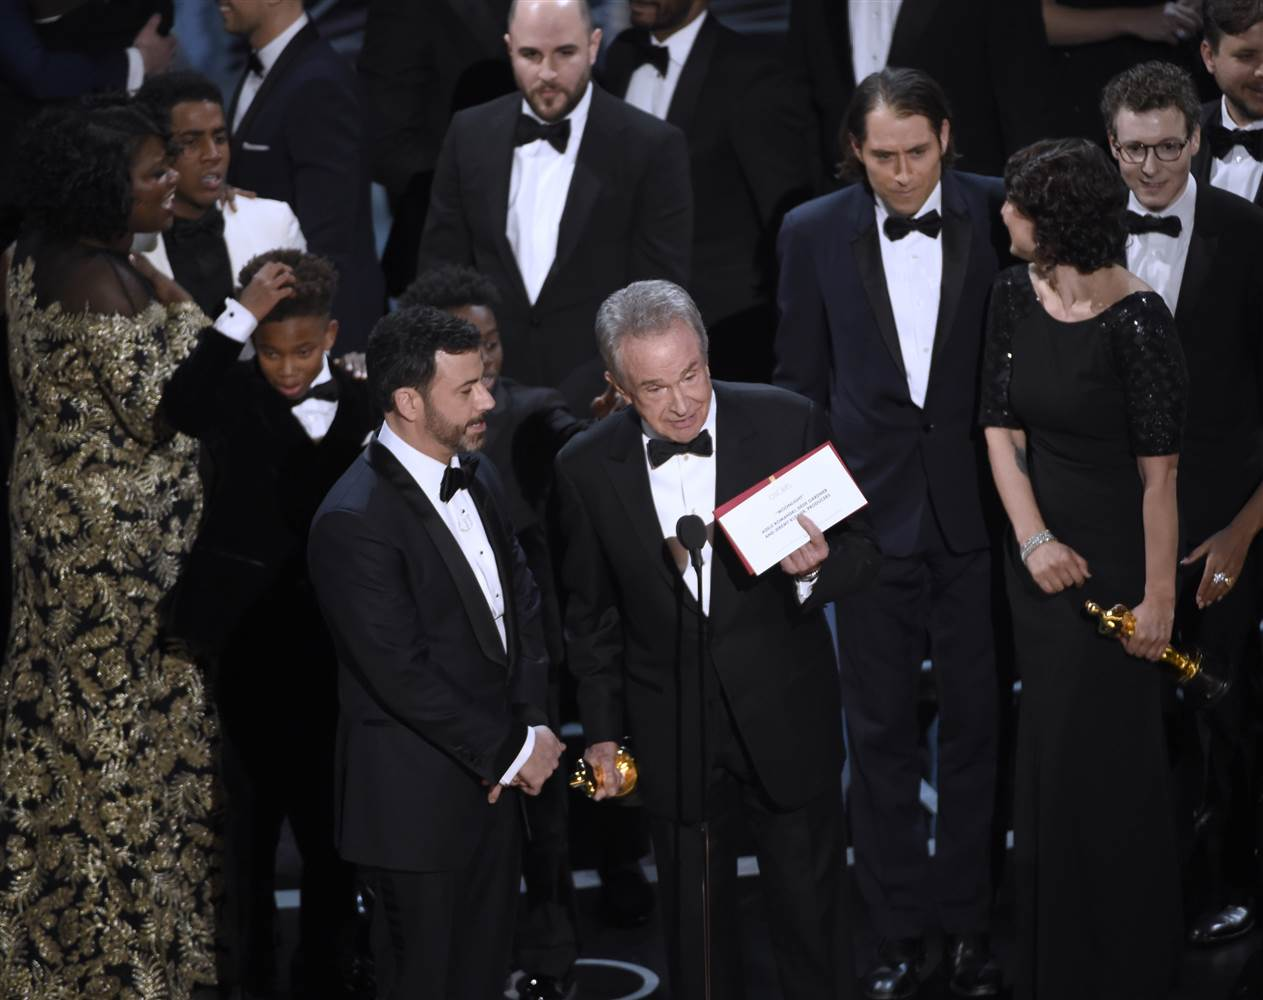 Warren Beatty explaining why he announced 'La La Land' as the Best Picture winner.